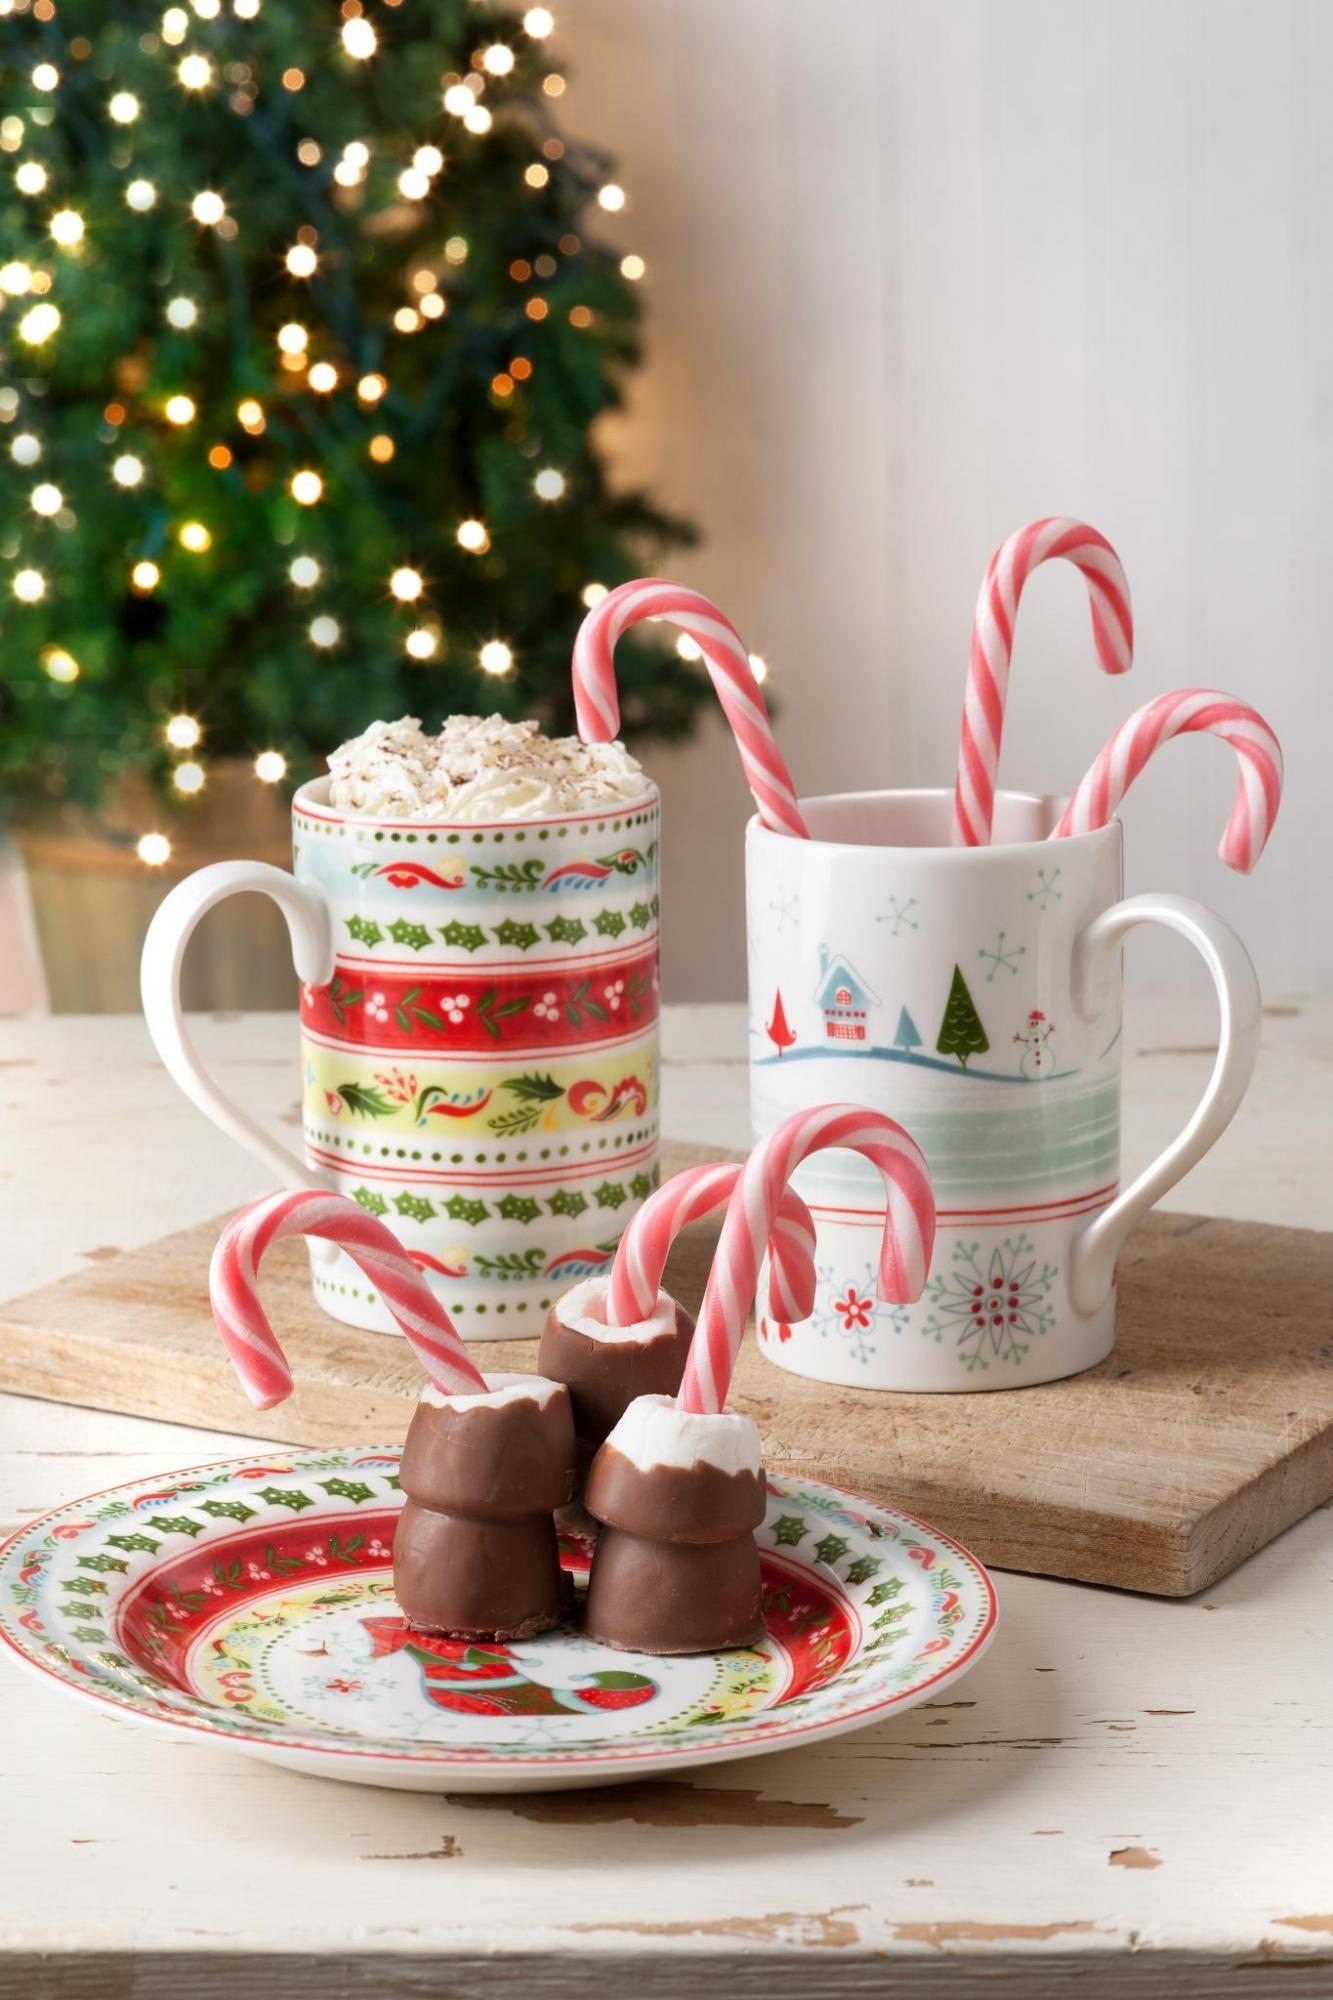 I Love Giving A Christmas Mug For Christmas Eve Celebrations Hot Chocolate And Candy Canes P Christmas Decor Inspiration Christmas Tableware Christmas Wishes